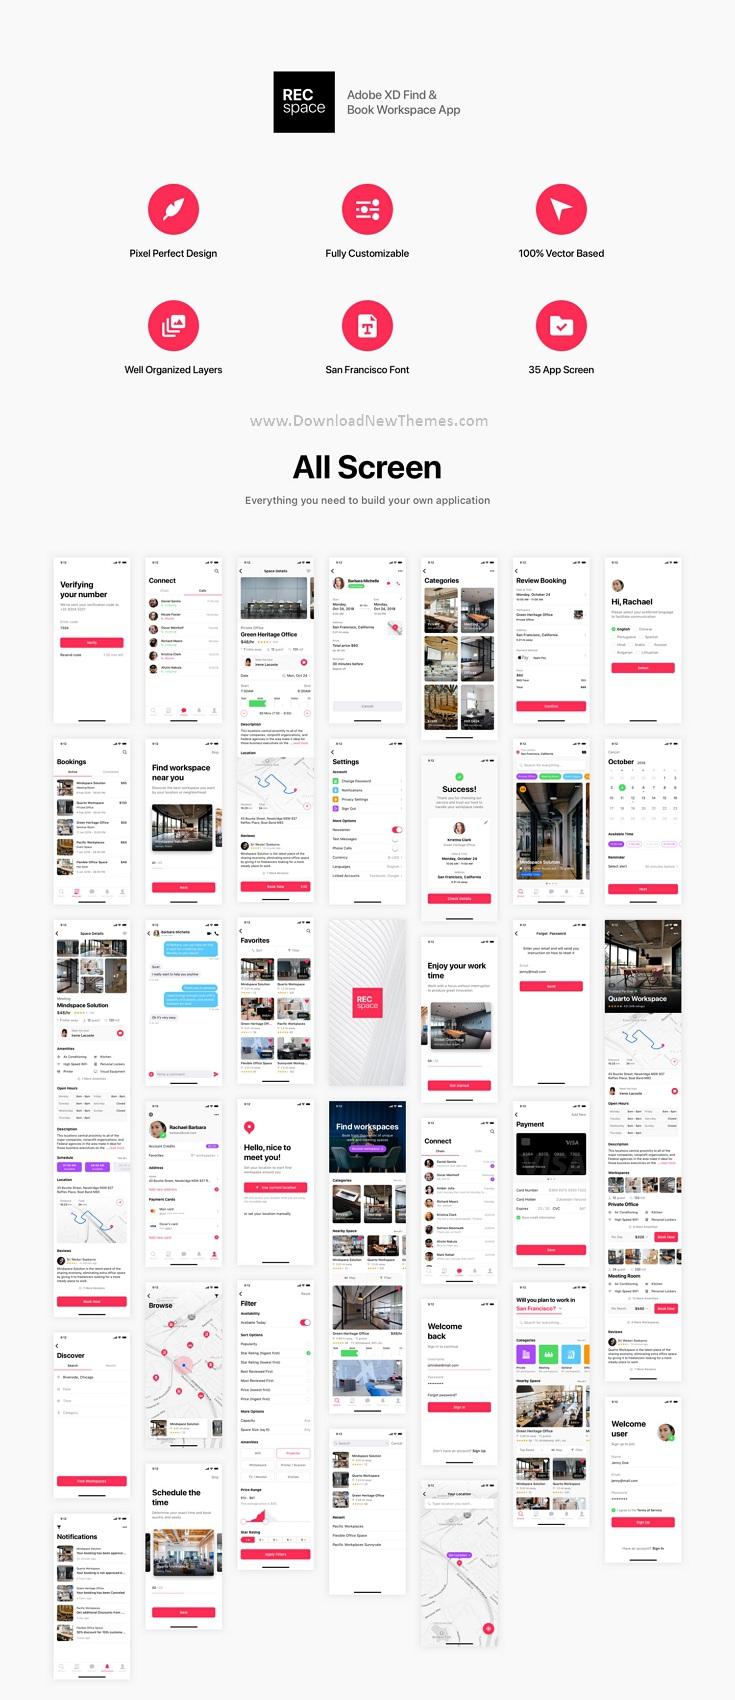 Find & Book Workspace App Template